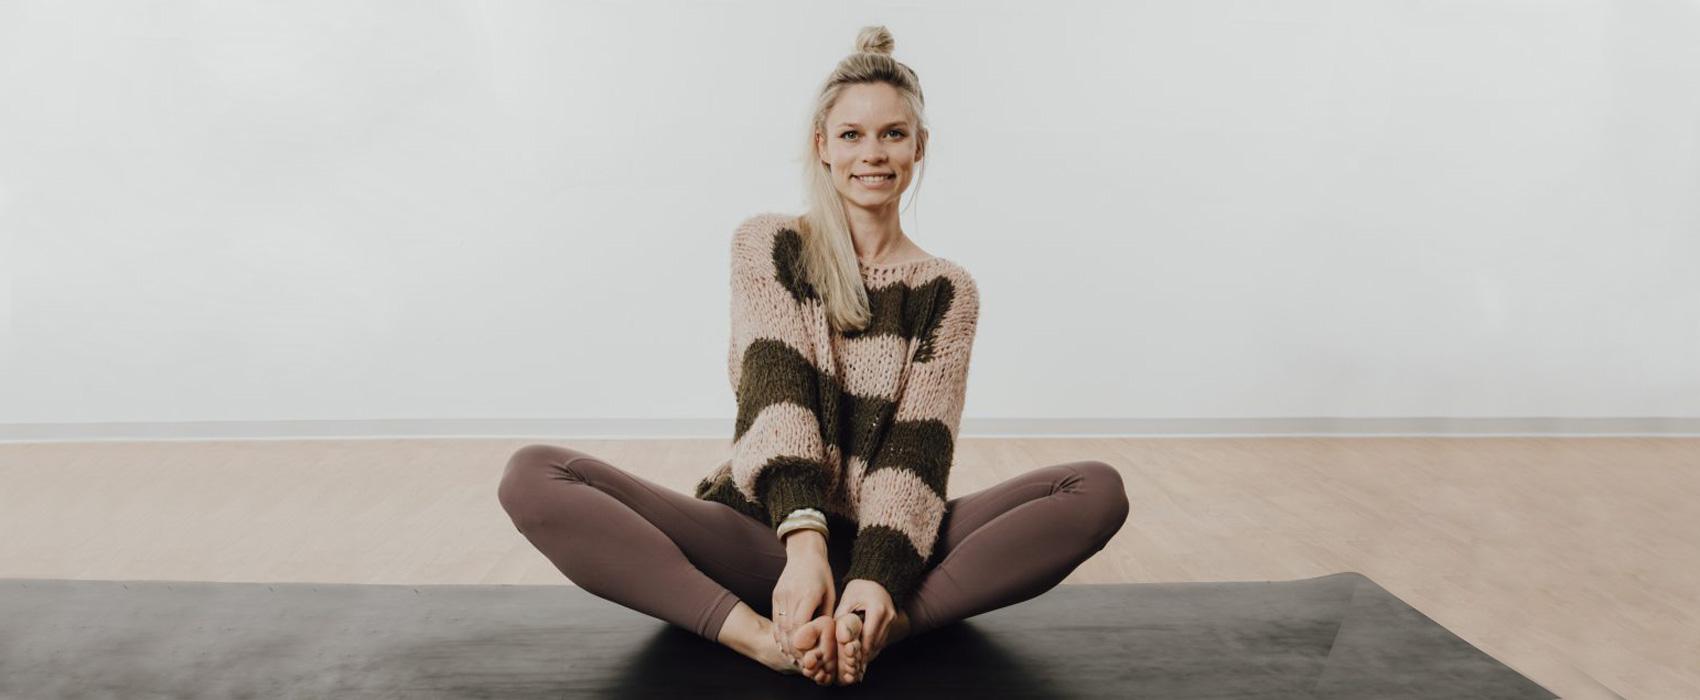 O.MY.YOGA Ulm, Anna Altrichter Yoga Lehrerin Ashtanga/Hatha und RYT500h aus Ulm. Yoga Kurse für Asthanga, Vinyasa und Hatha. yoga ulm